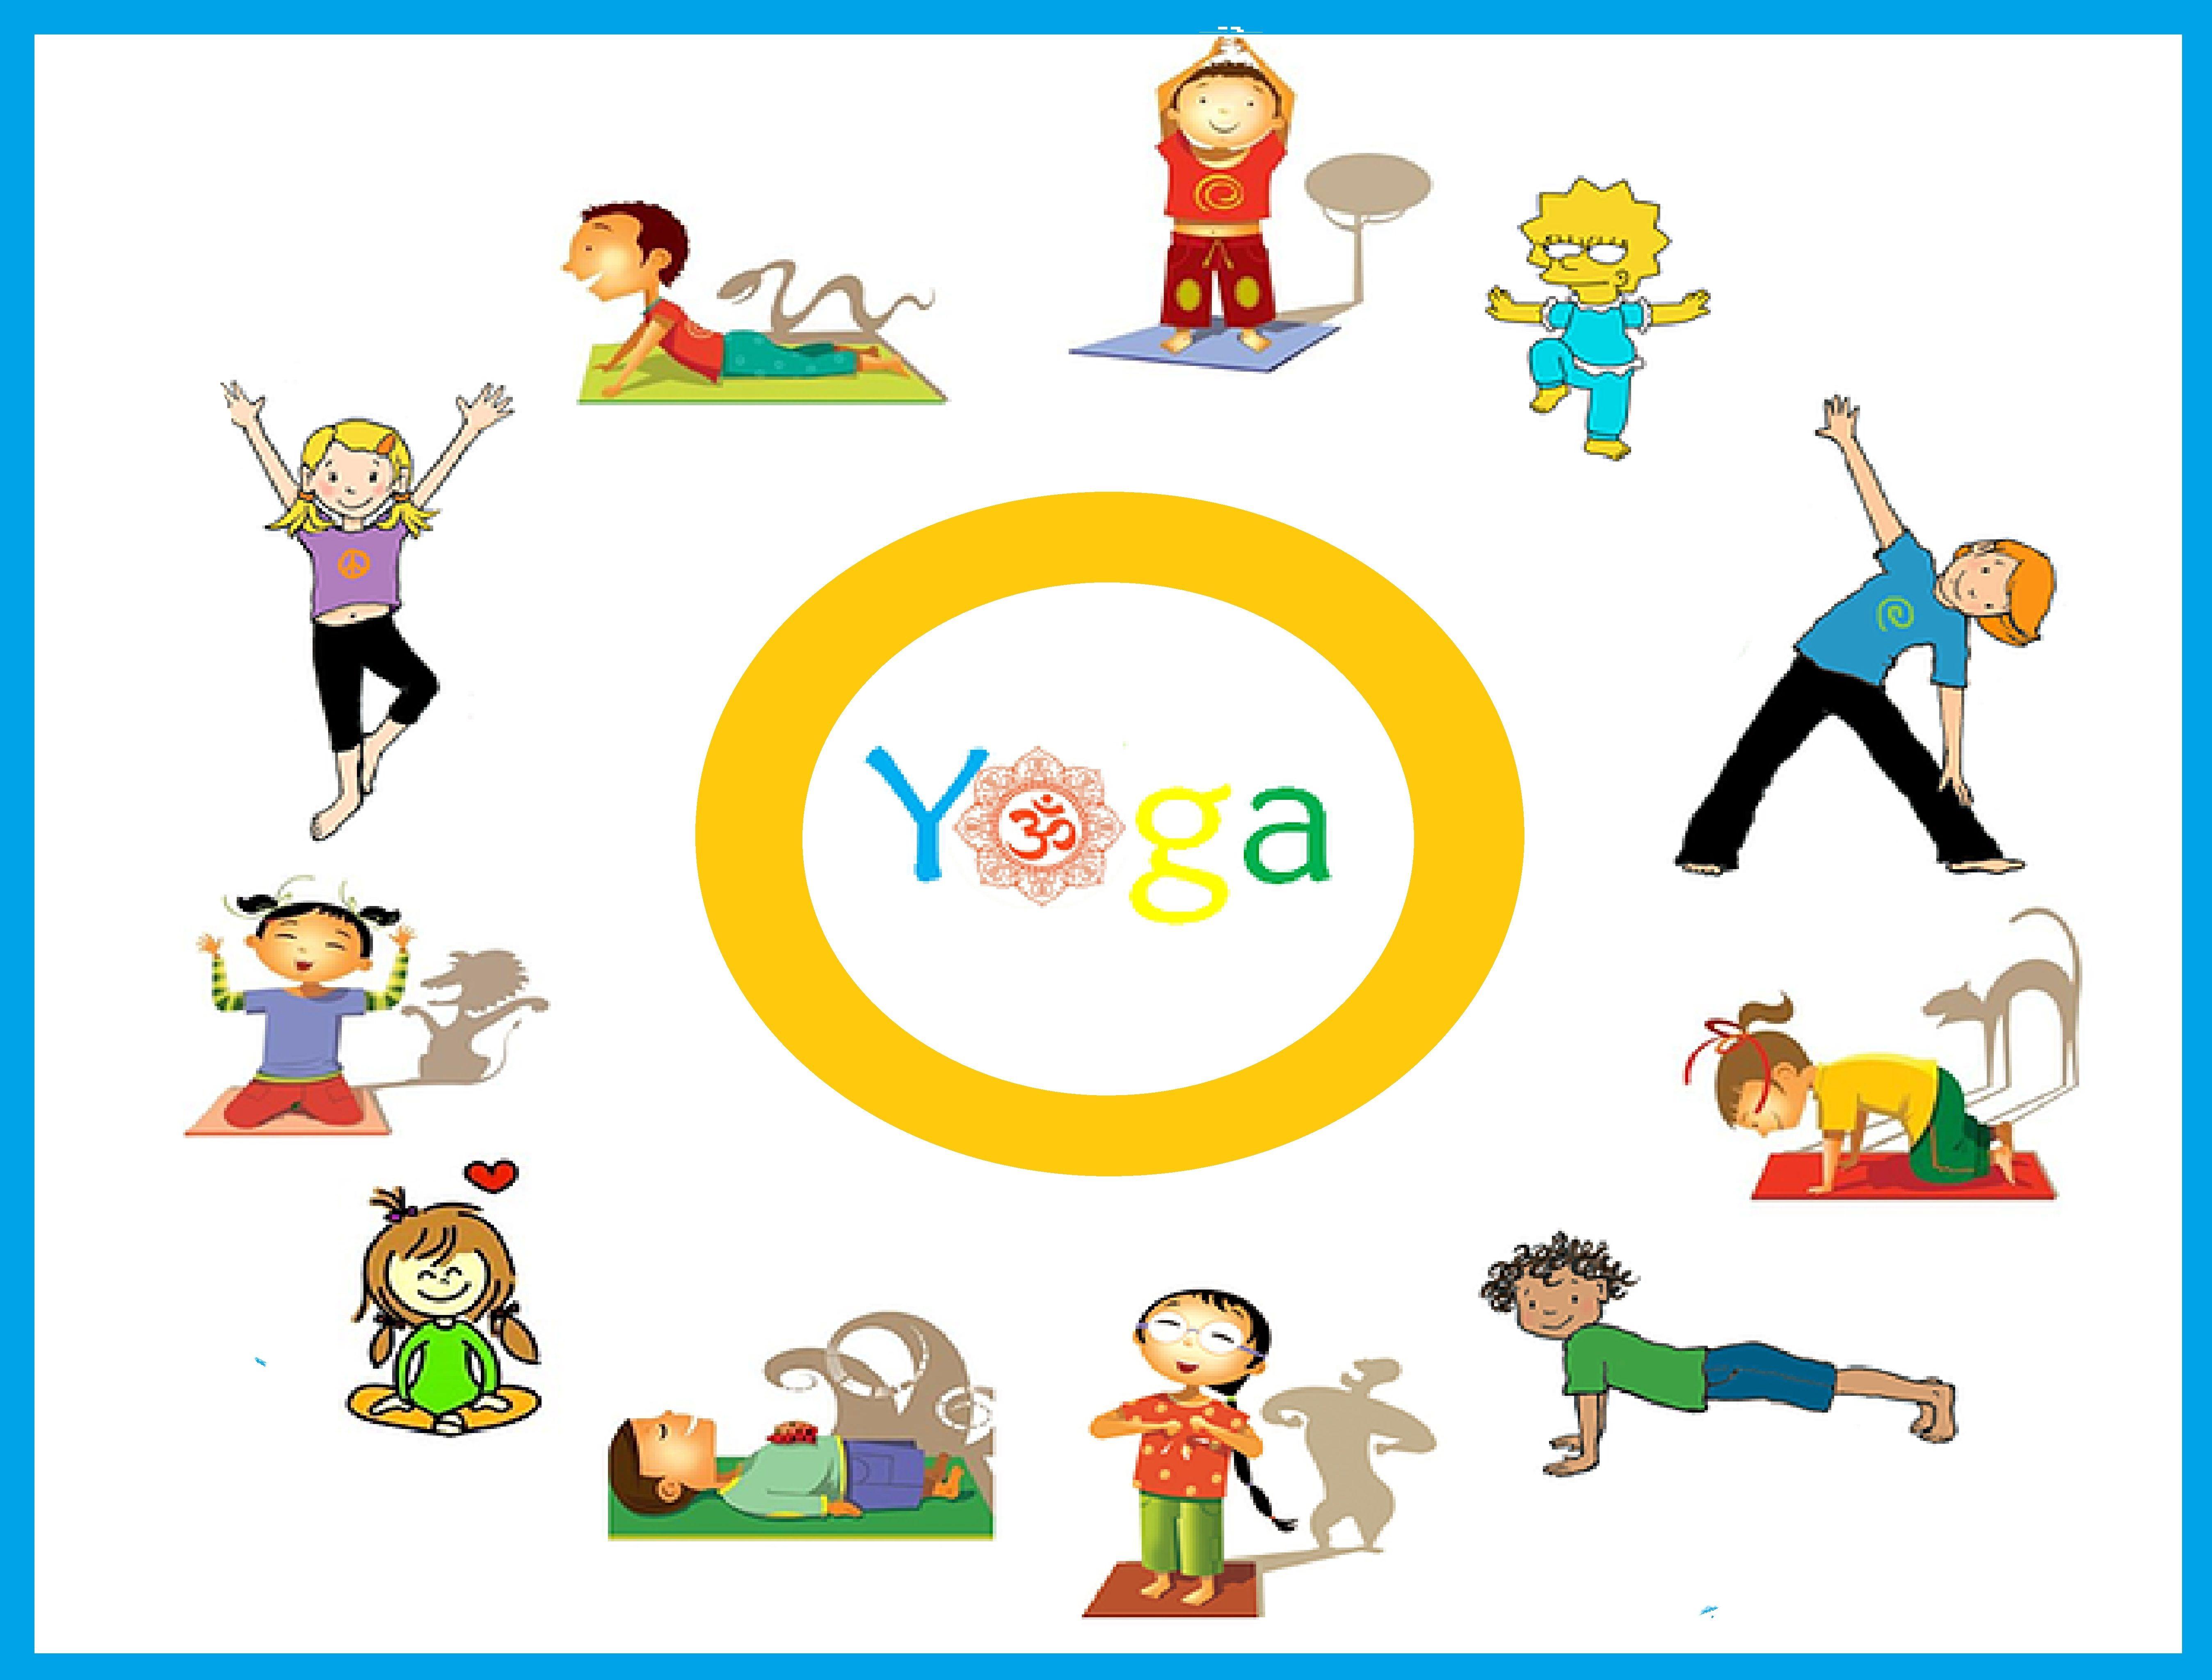 Posturas Divertidas Asanas De Yoga Infantil Yoga Infantil Yoga Para Niños Posturas De Yoga Para Niños